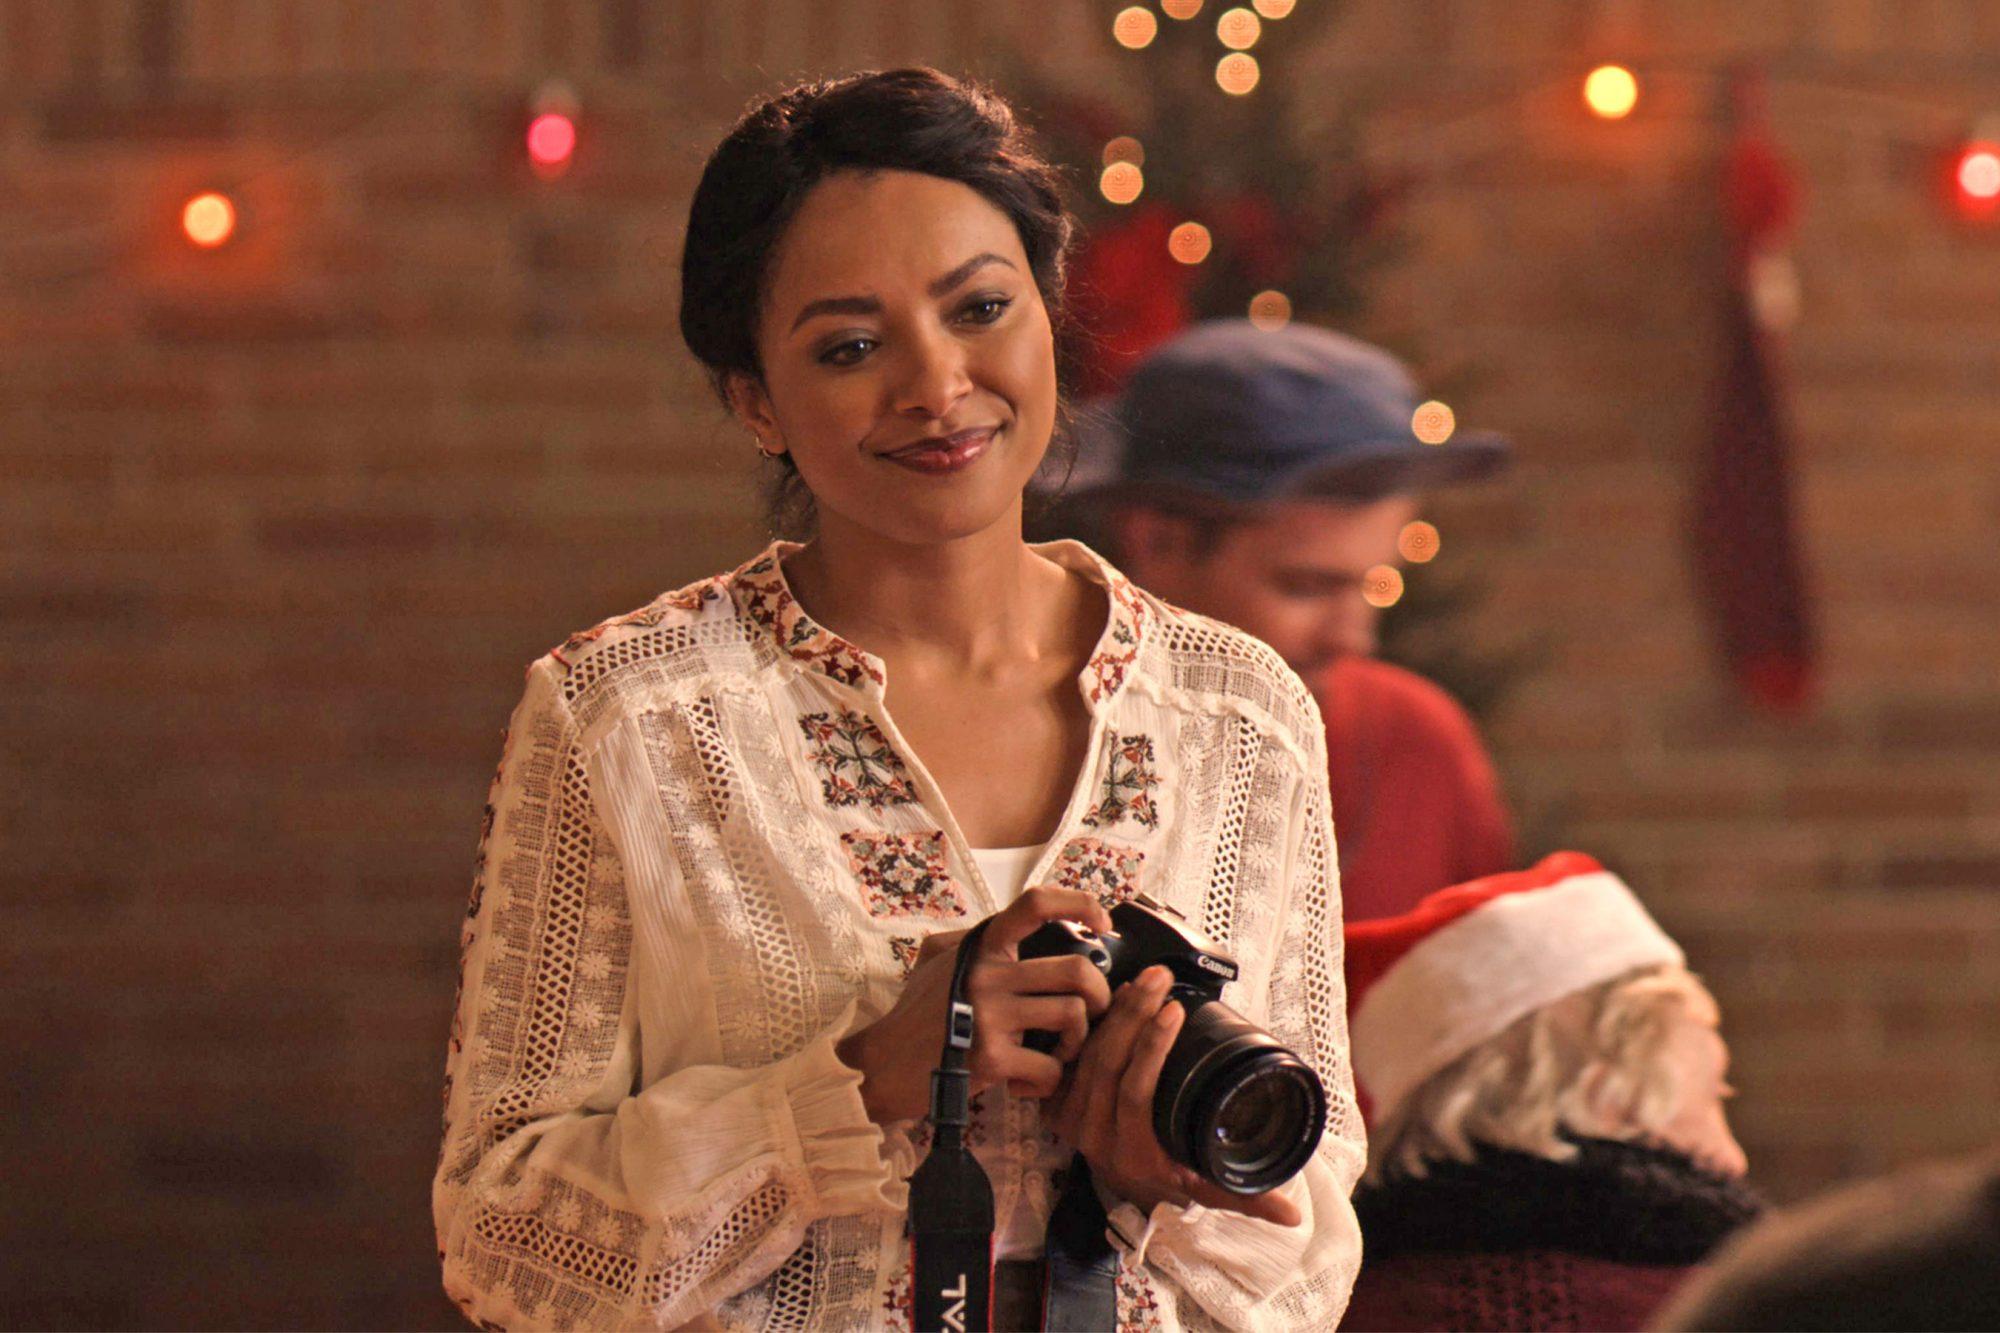 THE HOLIDAY CALENDAR (11/2)Cast: Kat GrahamCR: Netflix